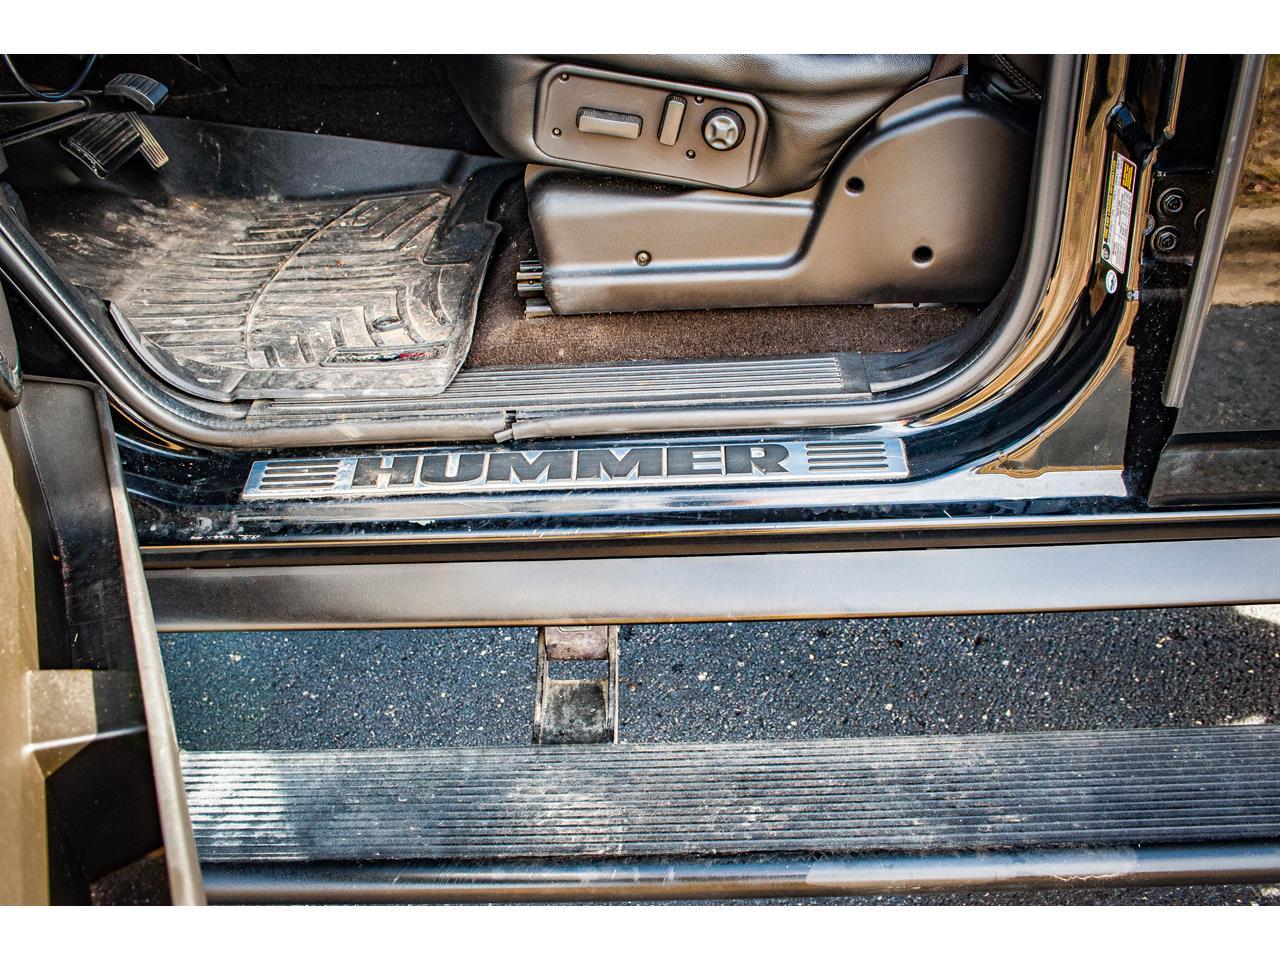 2005 Hummer H2 (CC-1322885) for sale in O'Fallon, Illinois